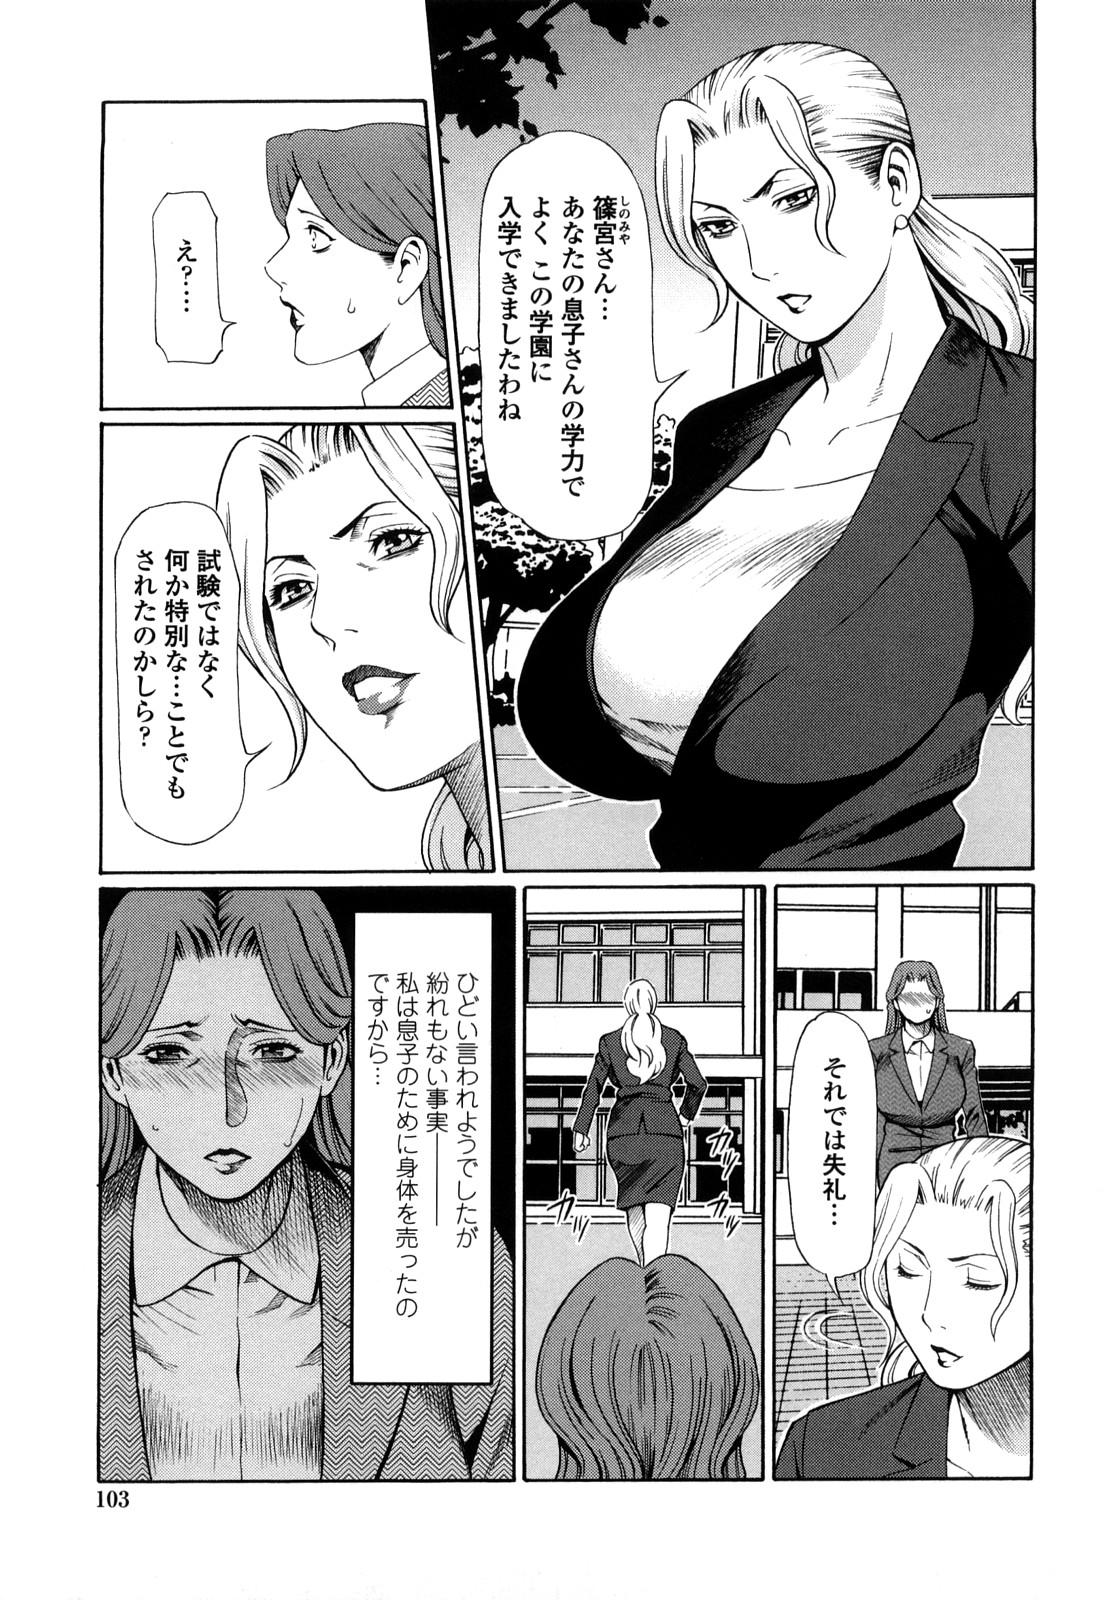 [Takasugi Kou] Kindan no Haha-Ana - Immorality Love-Hole [Decensored] 104